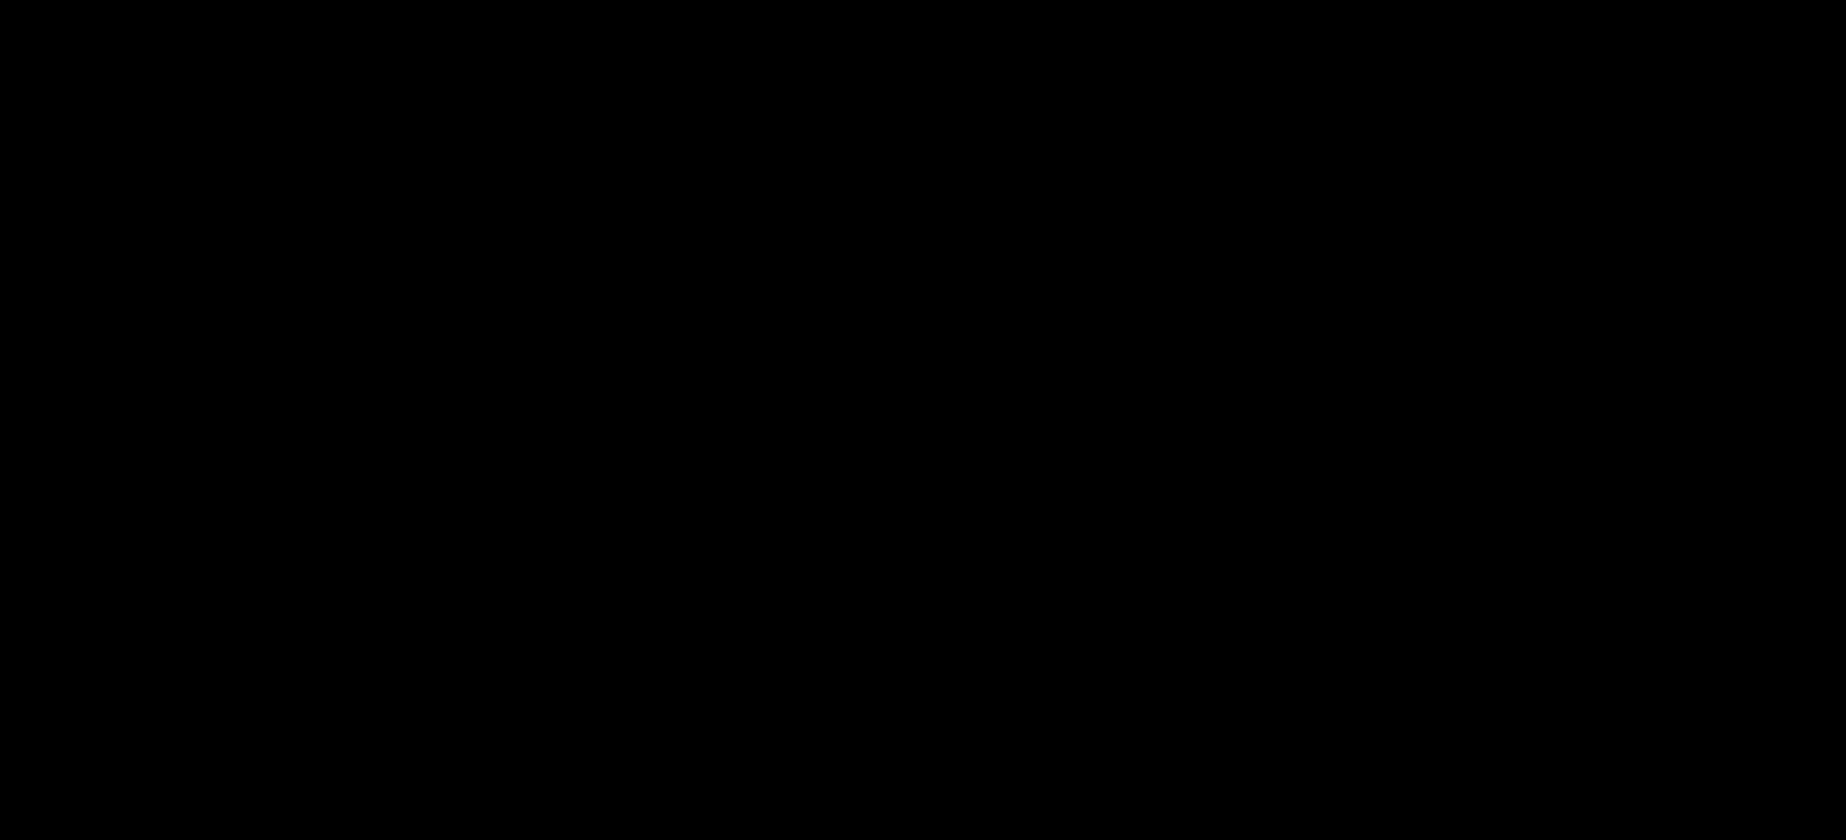 (S)-Crizotinib